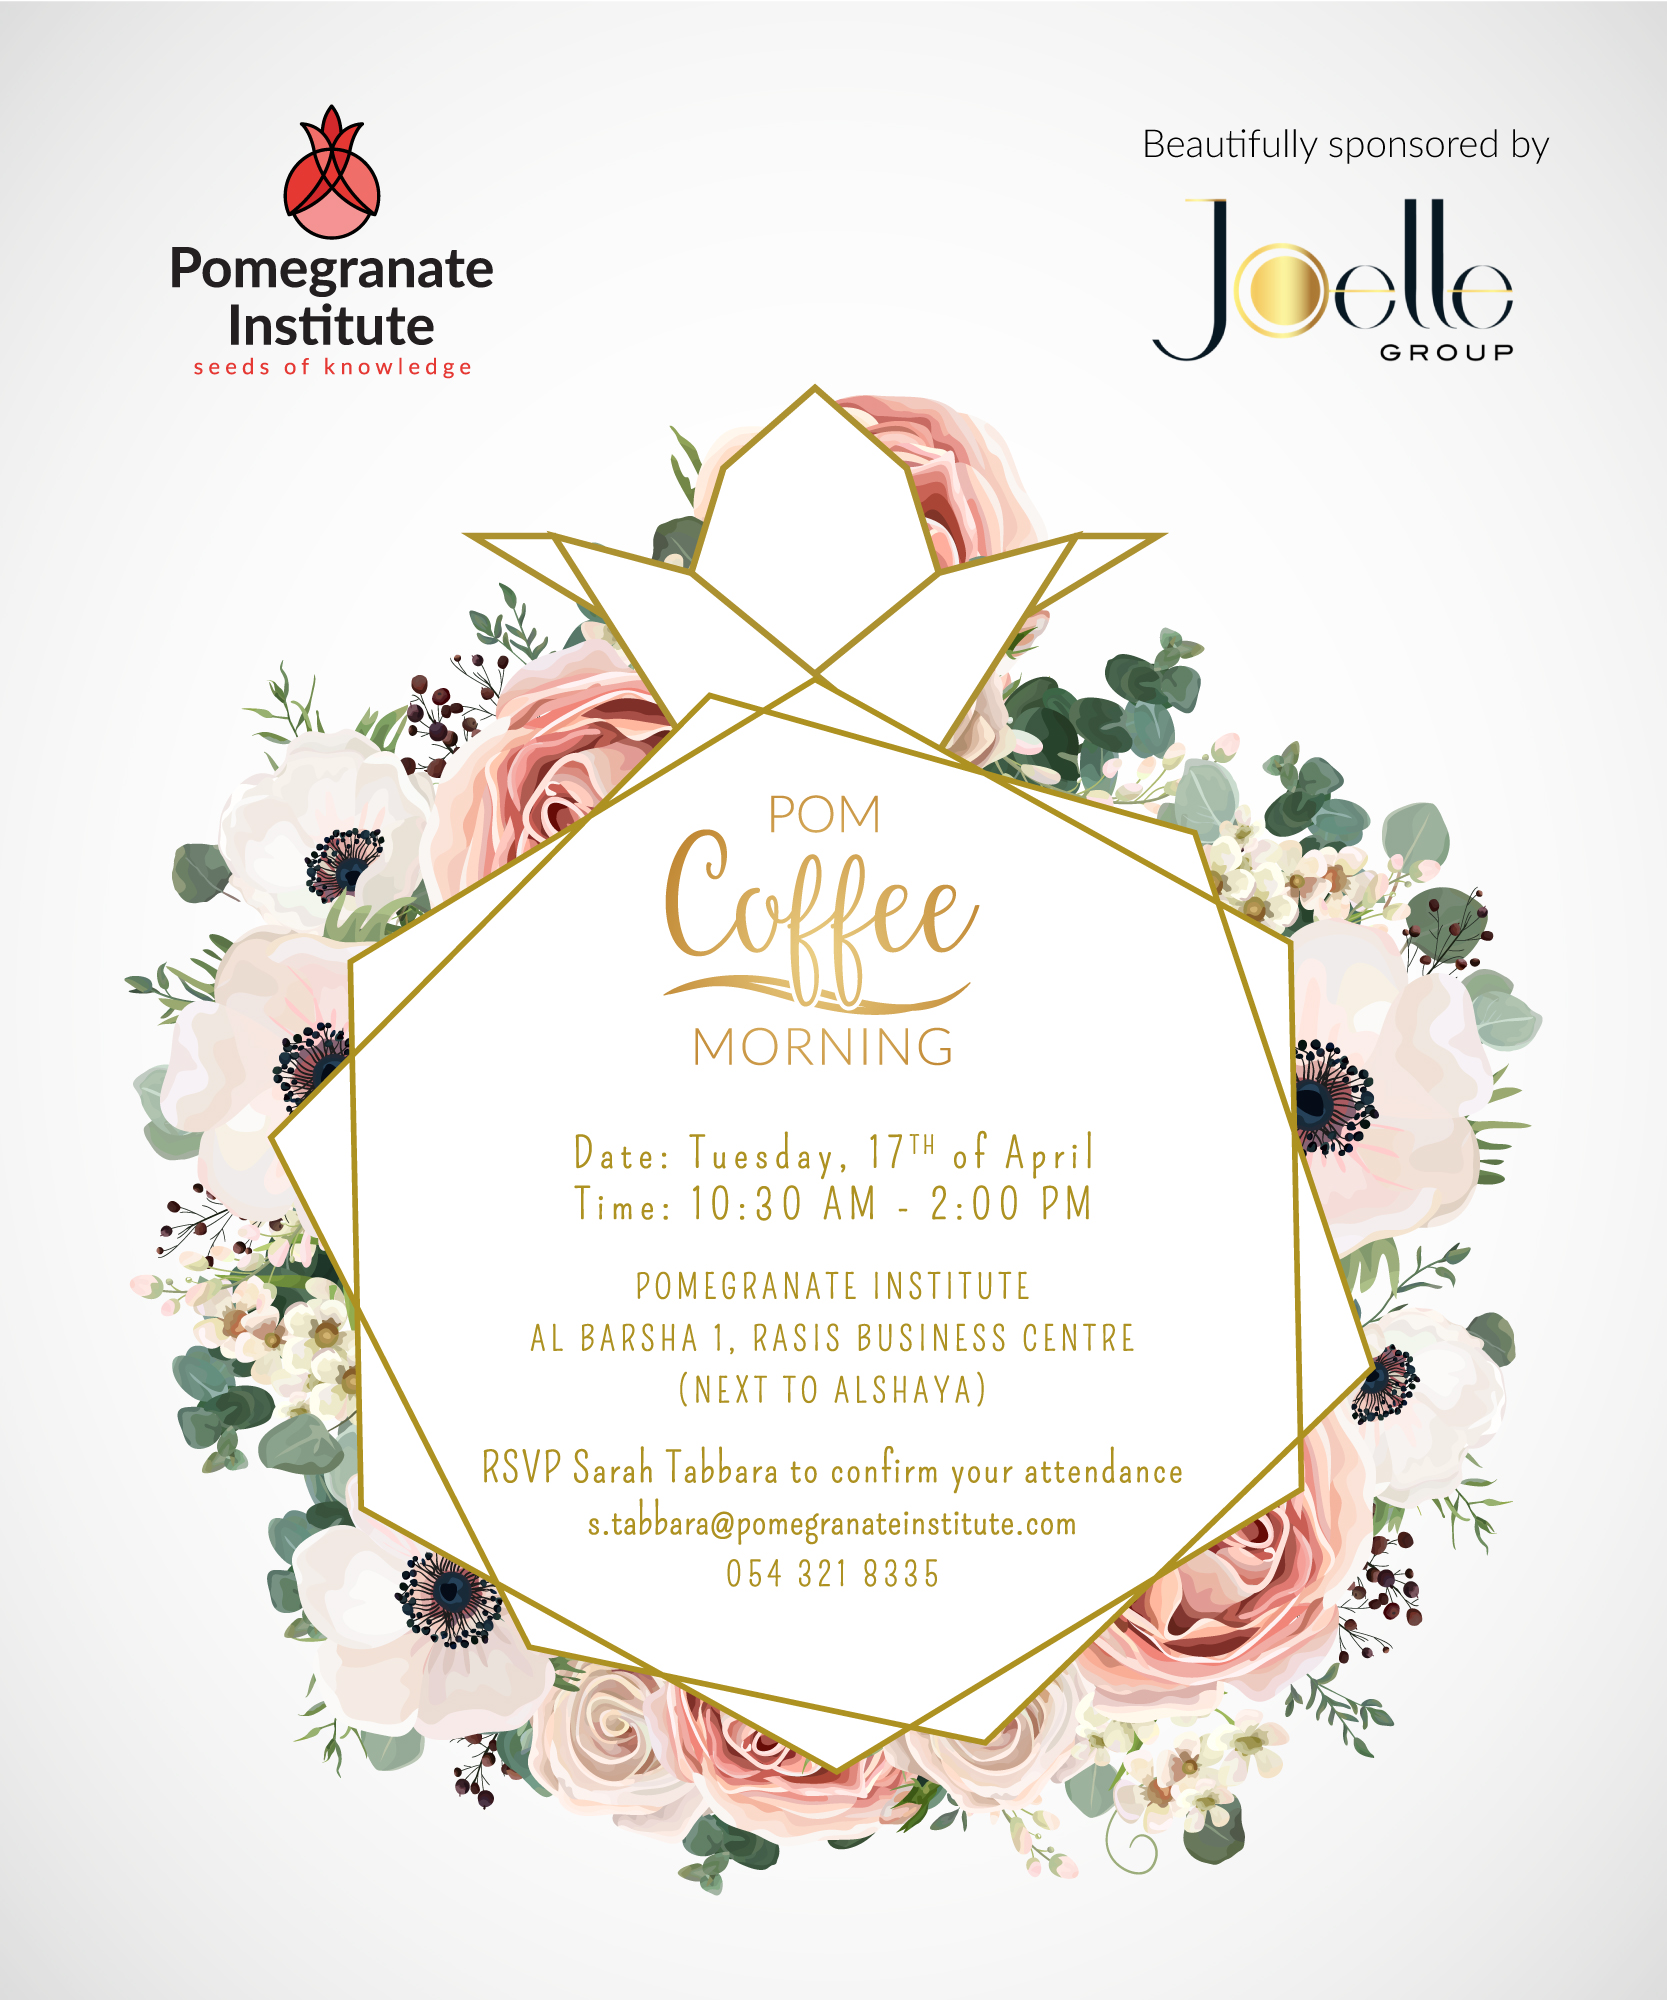 POM-Coffee Morning | Pomegranate Institute